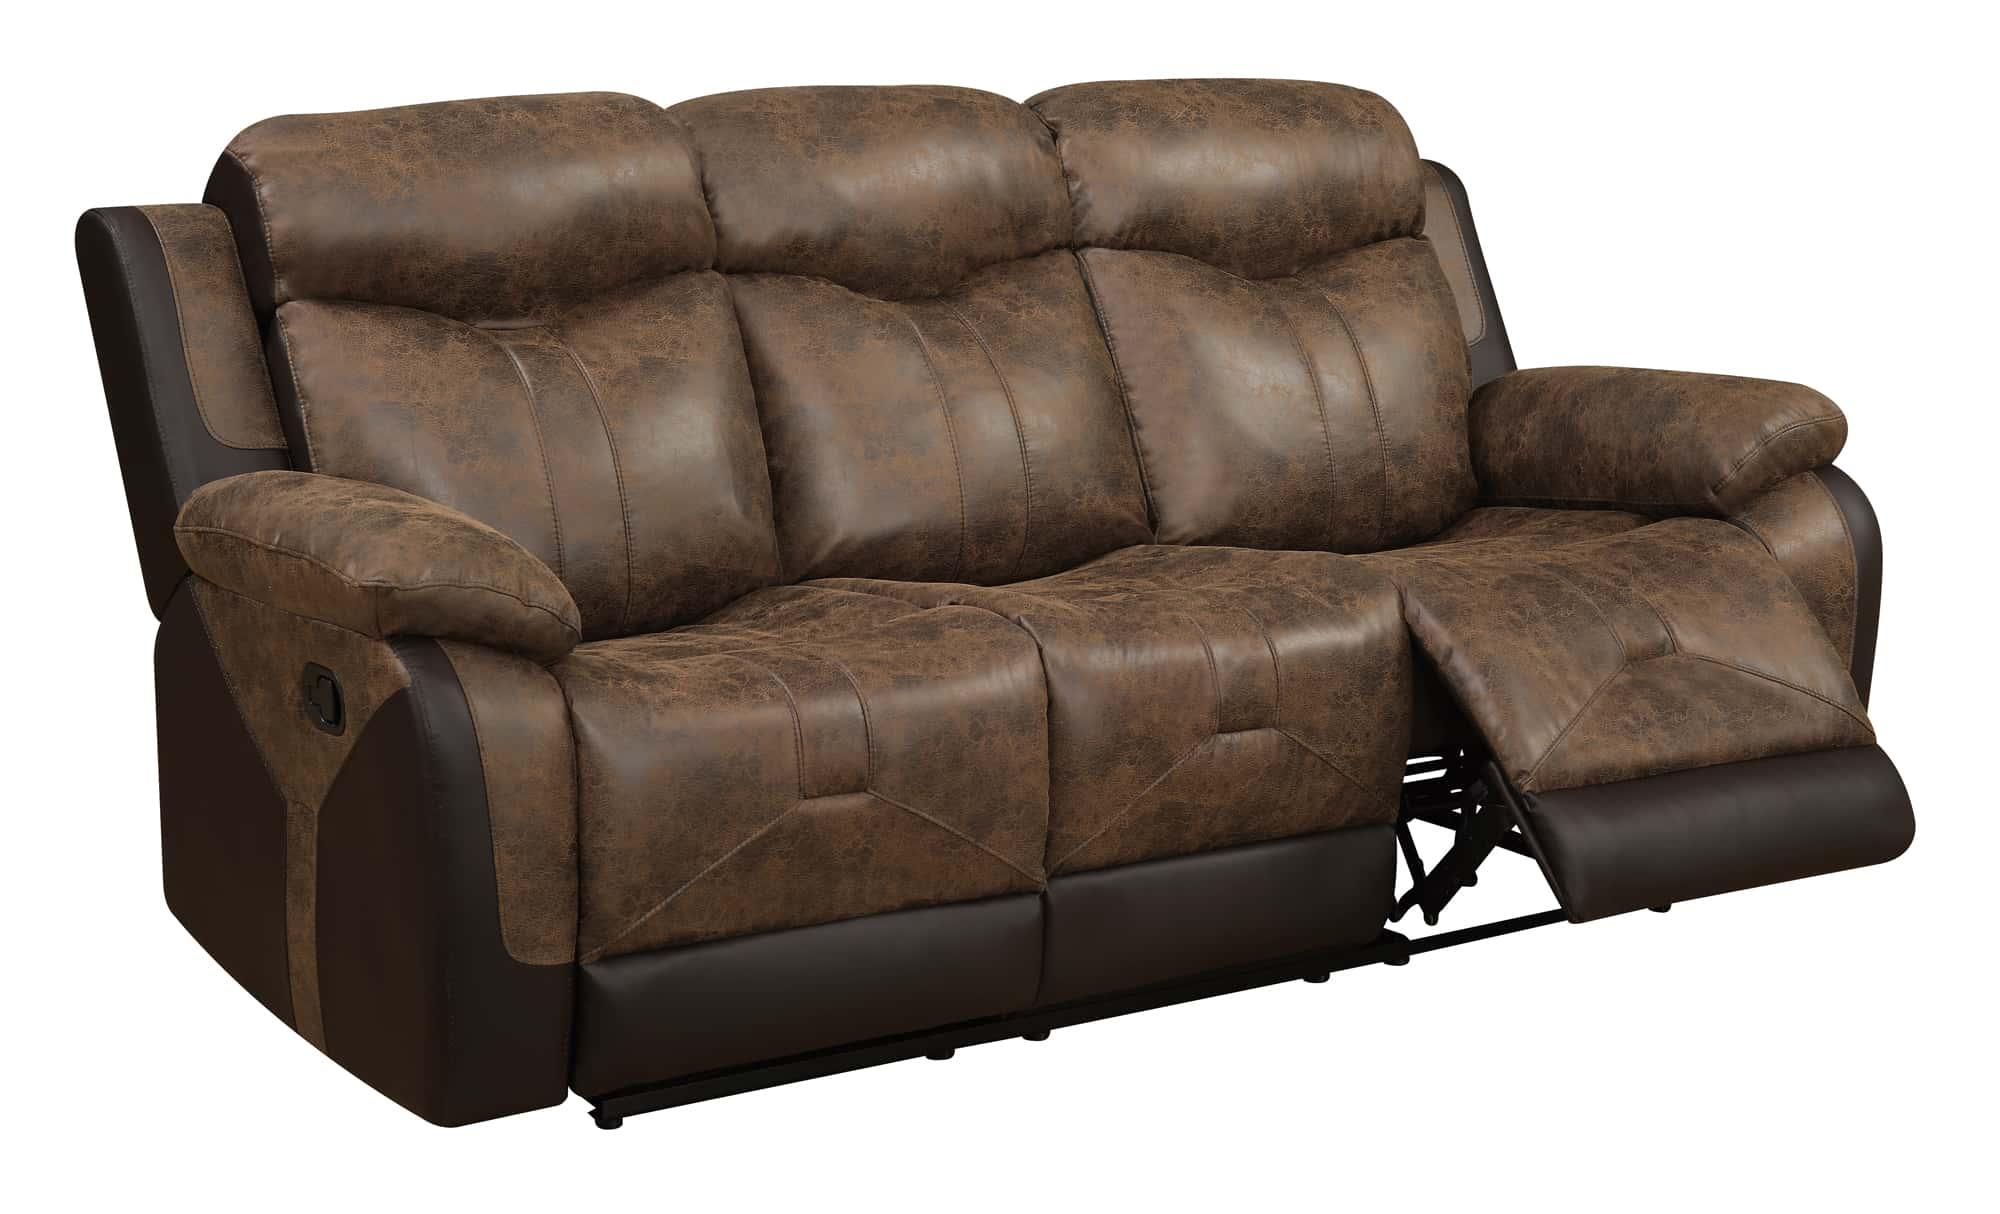 u2015 chocolate vinyl reclining sofa by global furniture. Black Bedroom Furniture Sets. Home Design Ideas